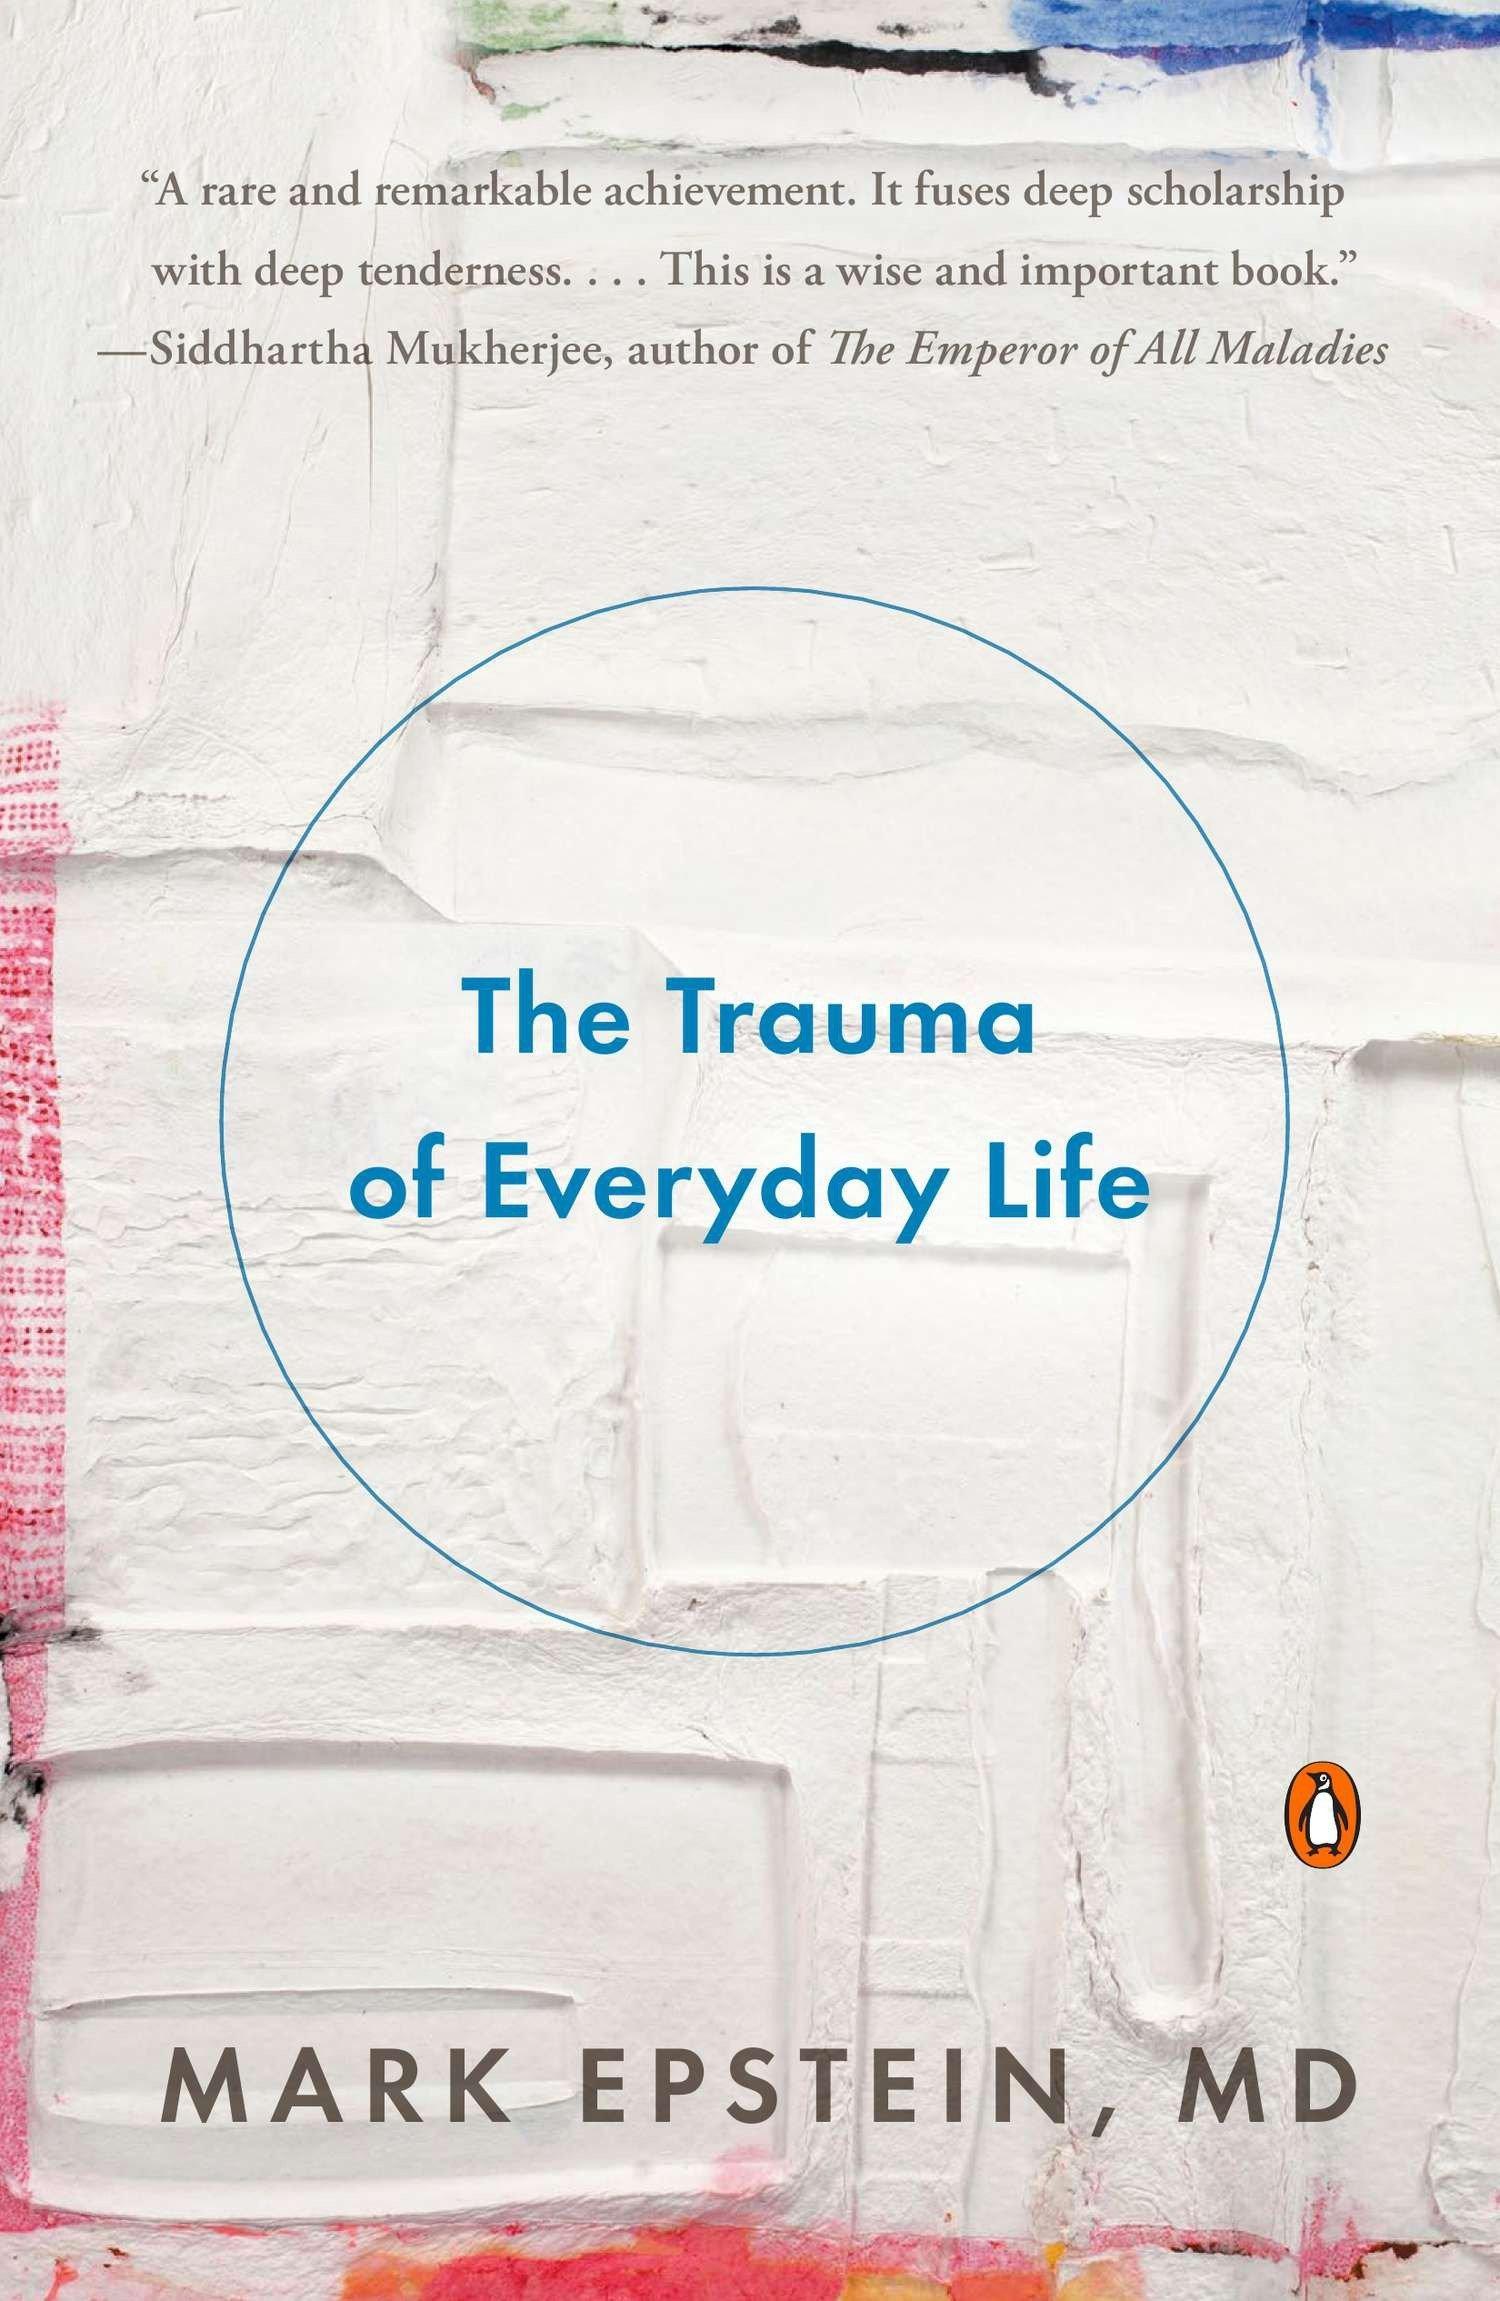 The Trauma of Everyday Life ebook